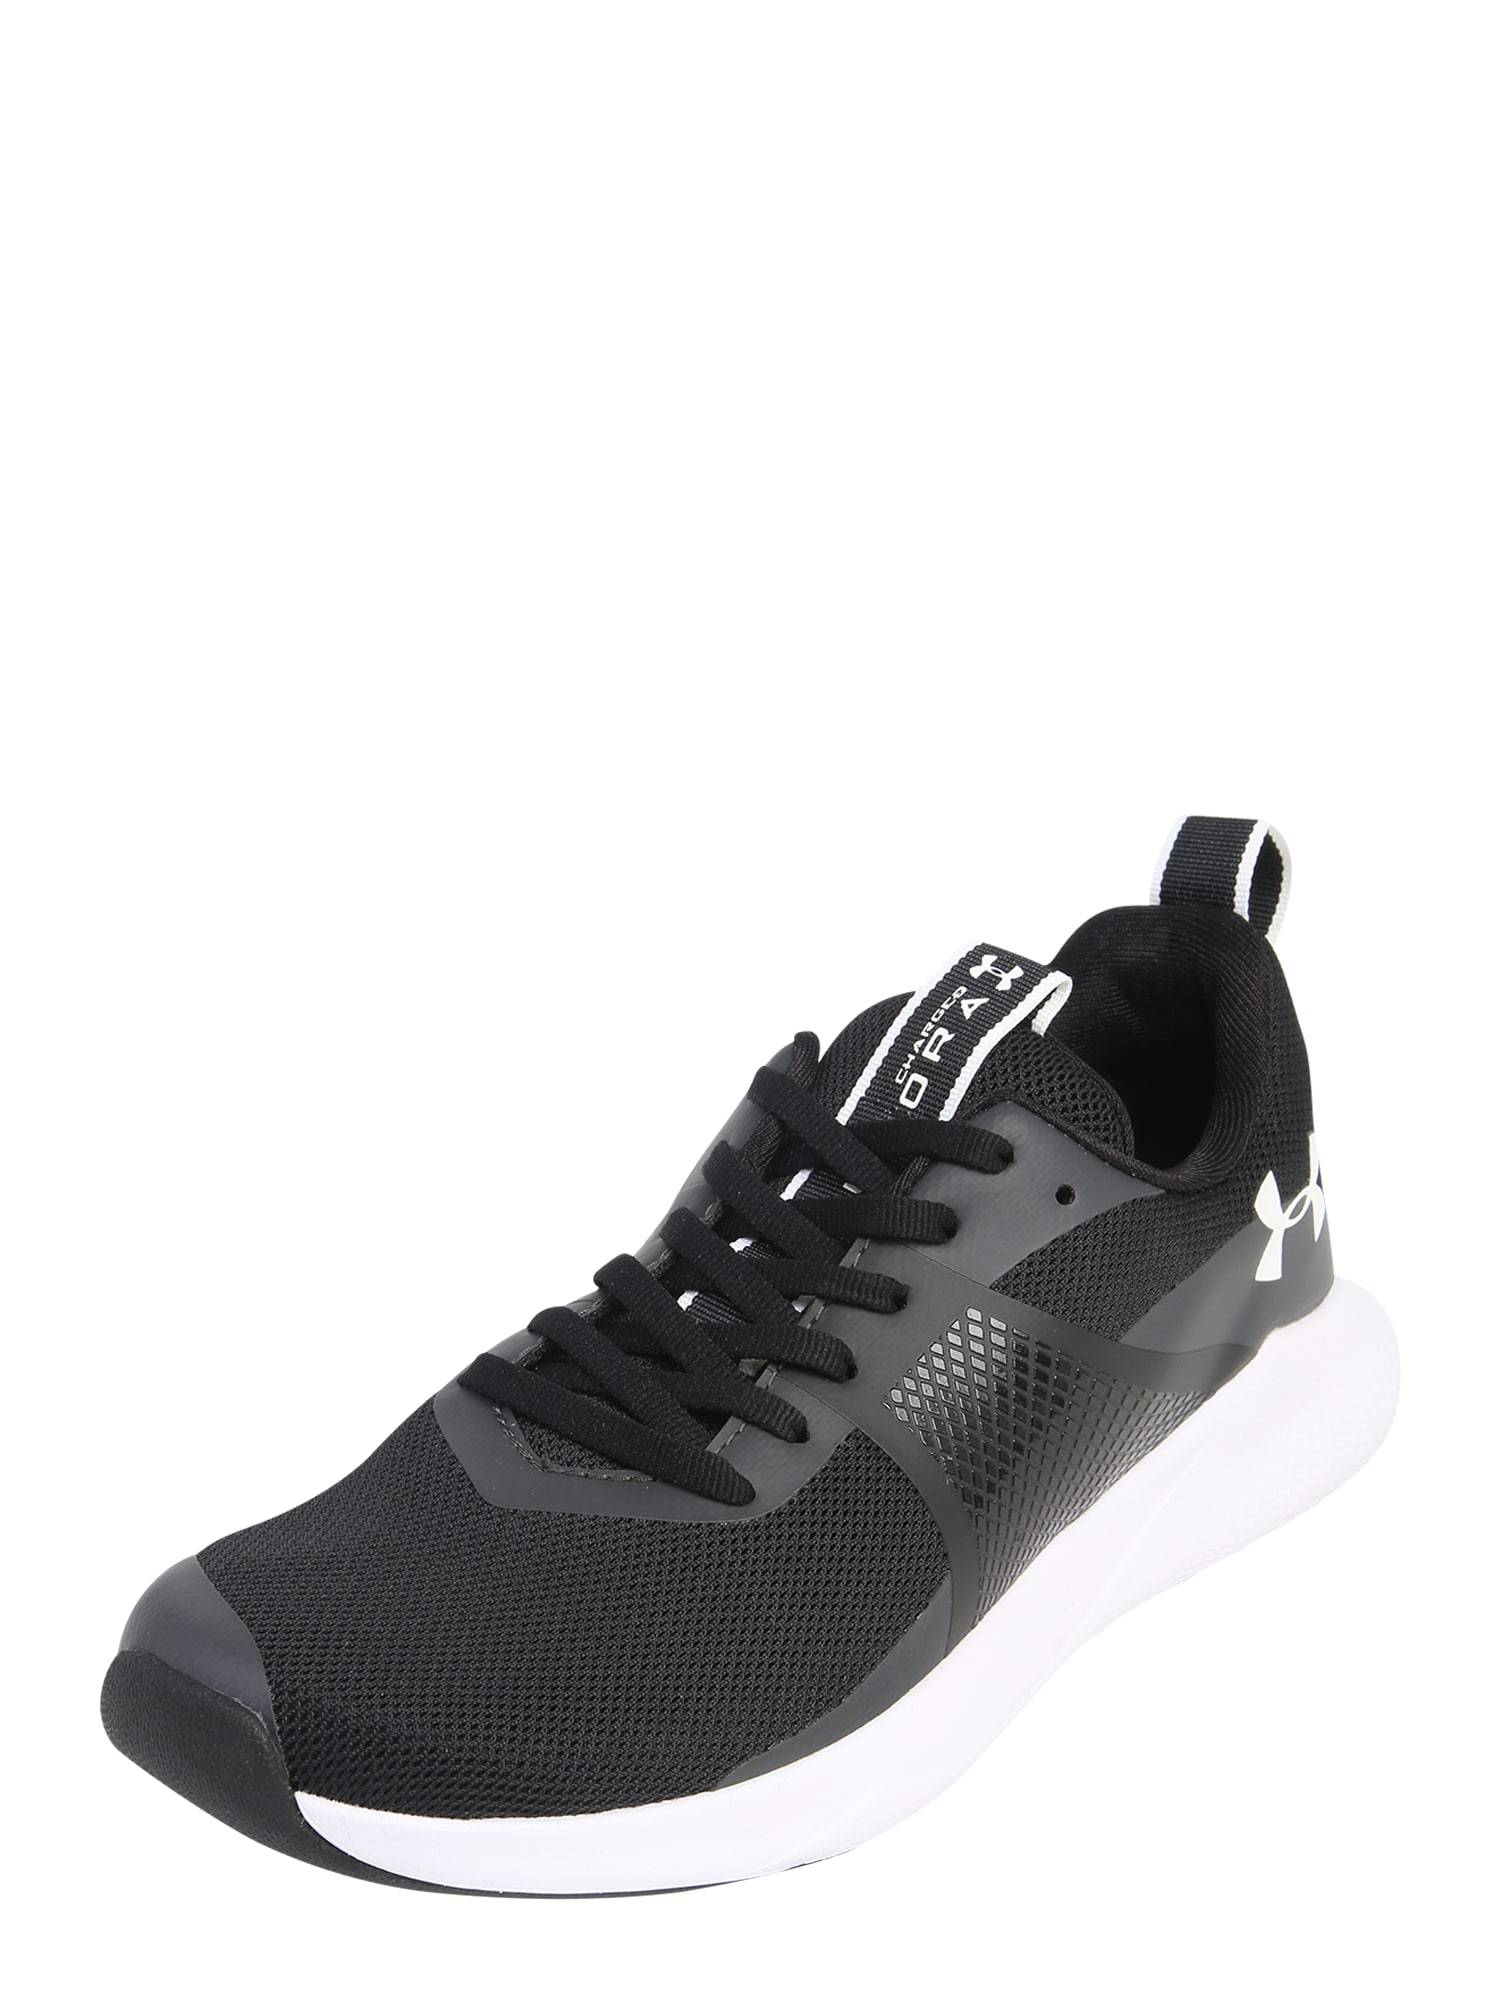 UNDER ARMOUR Chaussure de sport 'Aurora'  - Noir - Taille: 6 - female